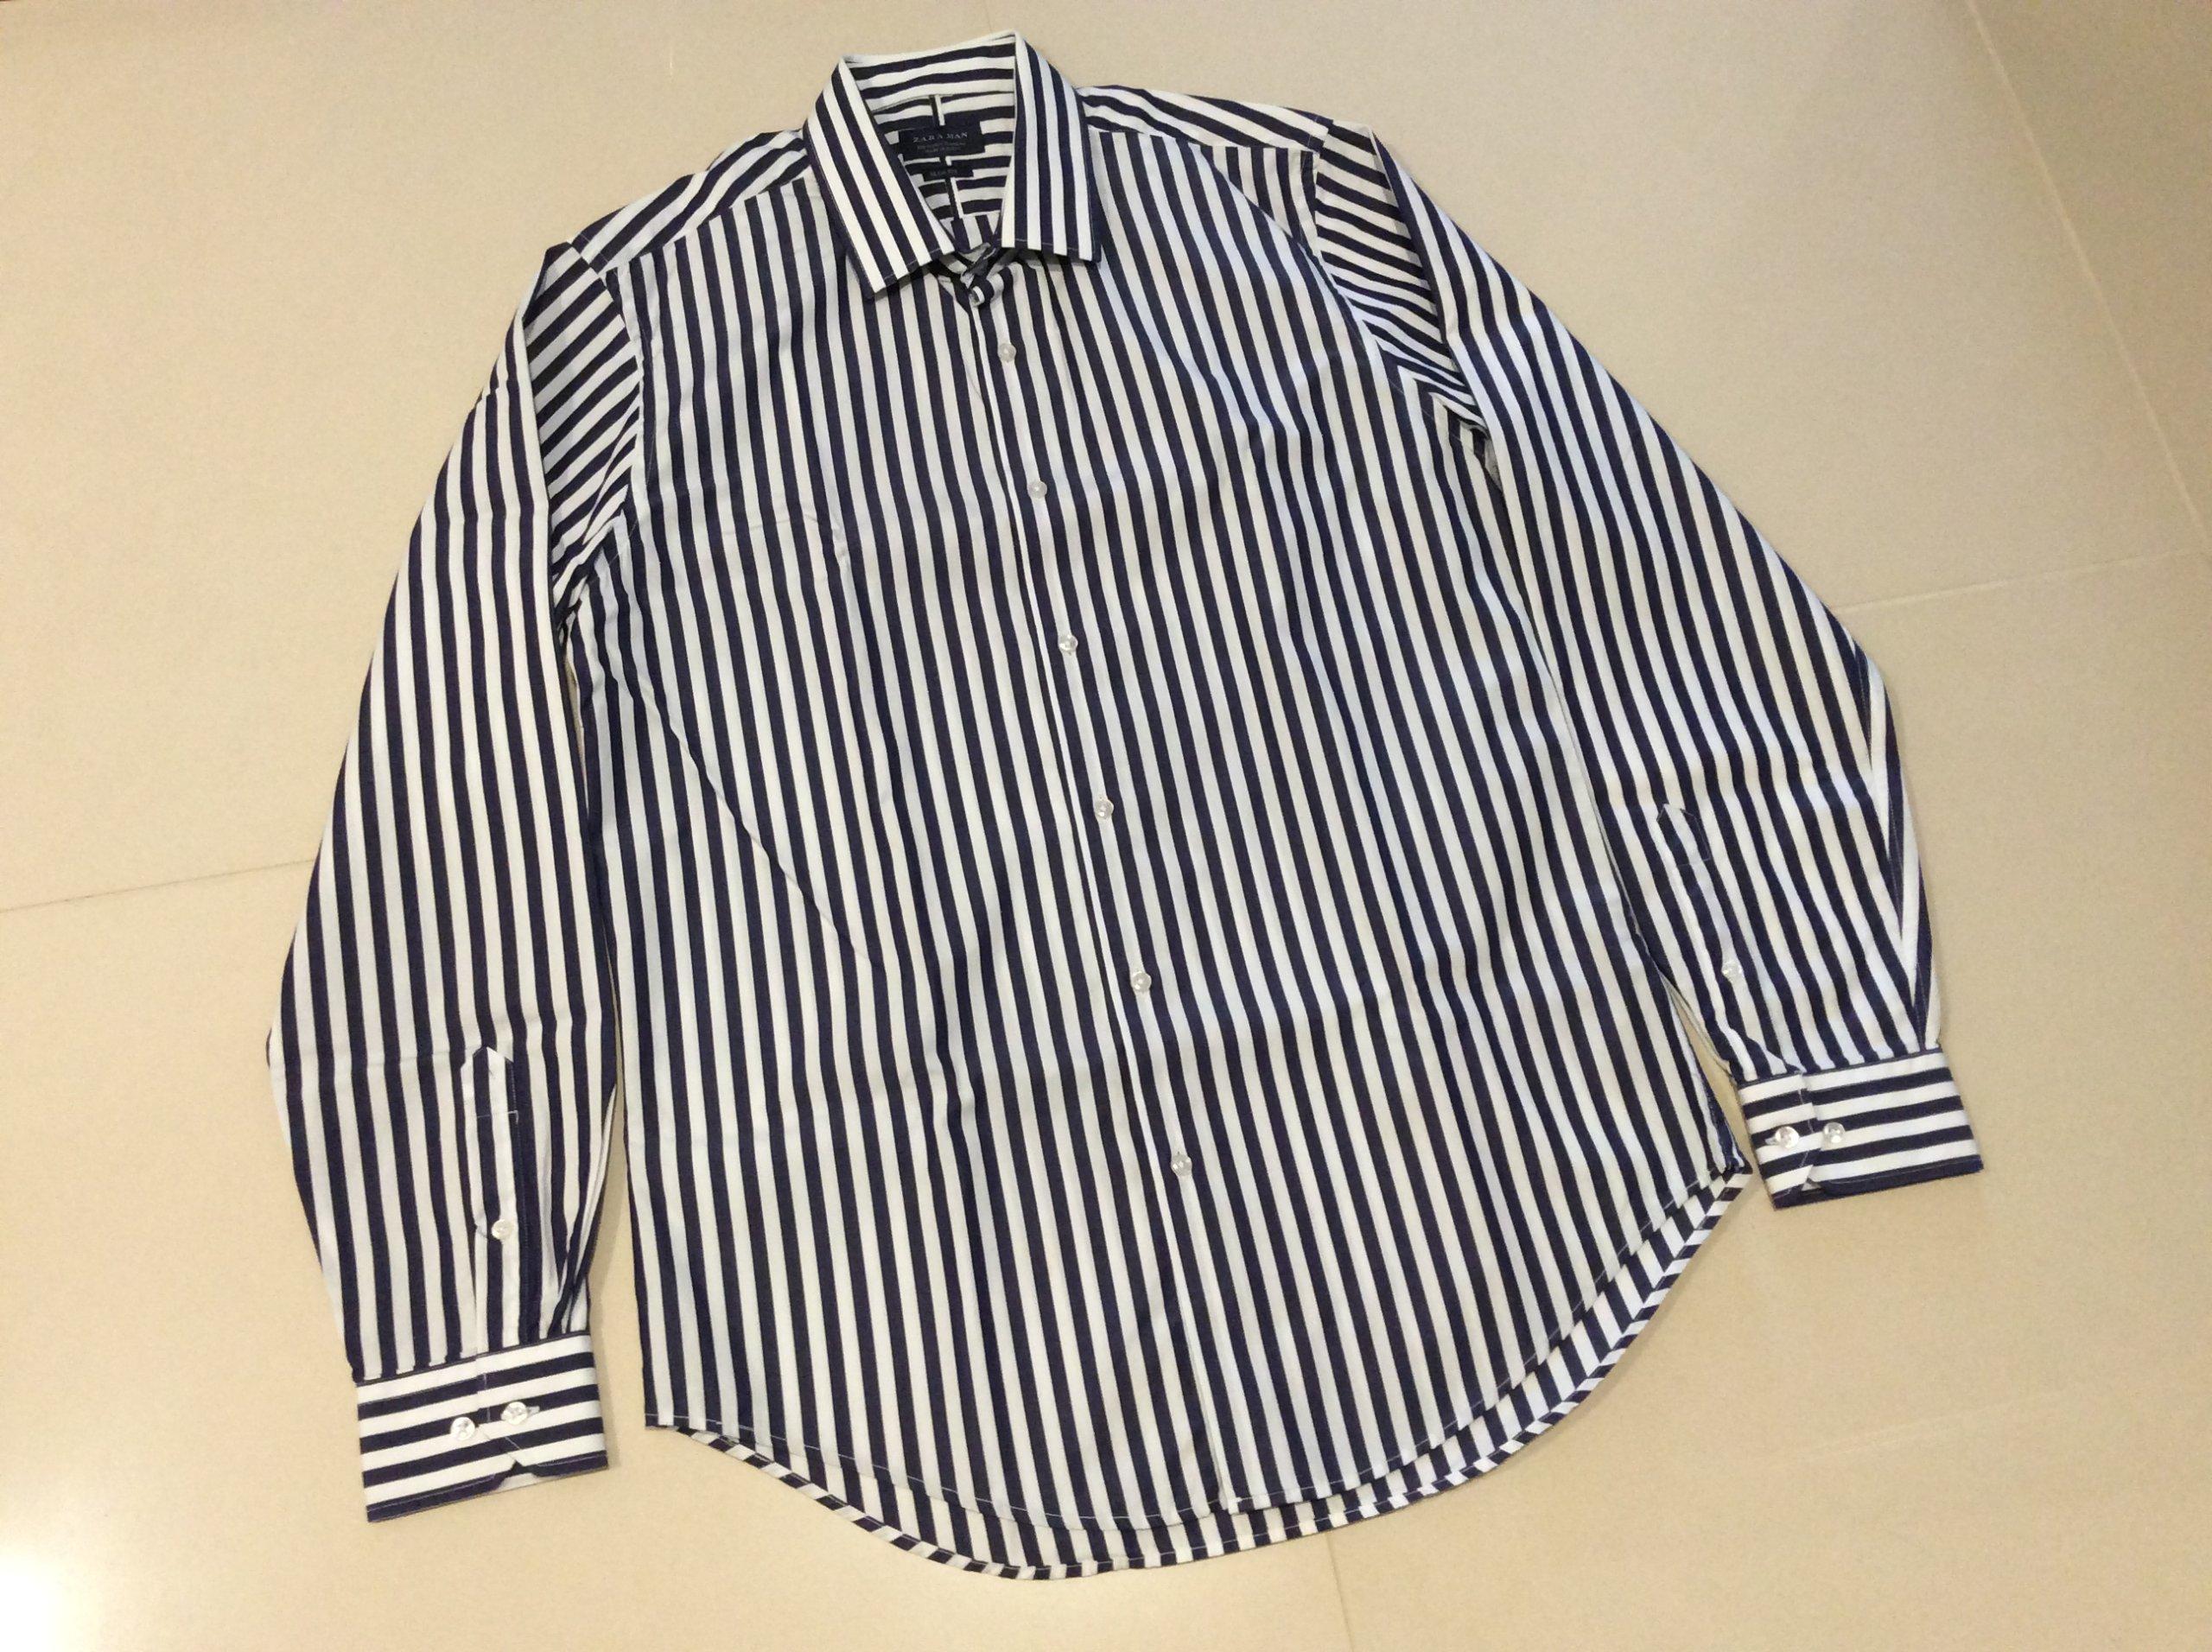 85b81743 Zara 3 Koszule Komplet 7182164944 amp;m H Oficjalne Archiwum Allegro ...